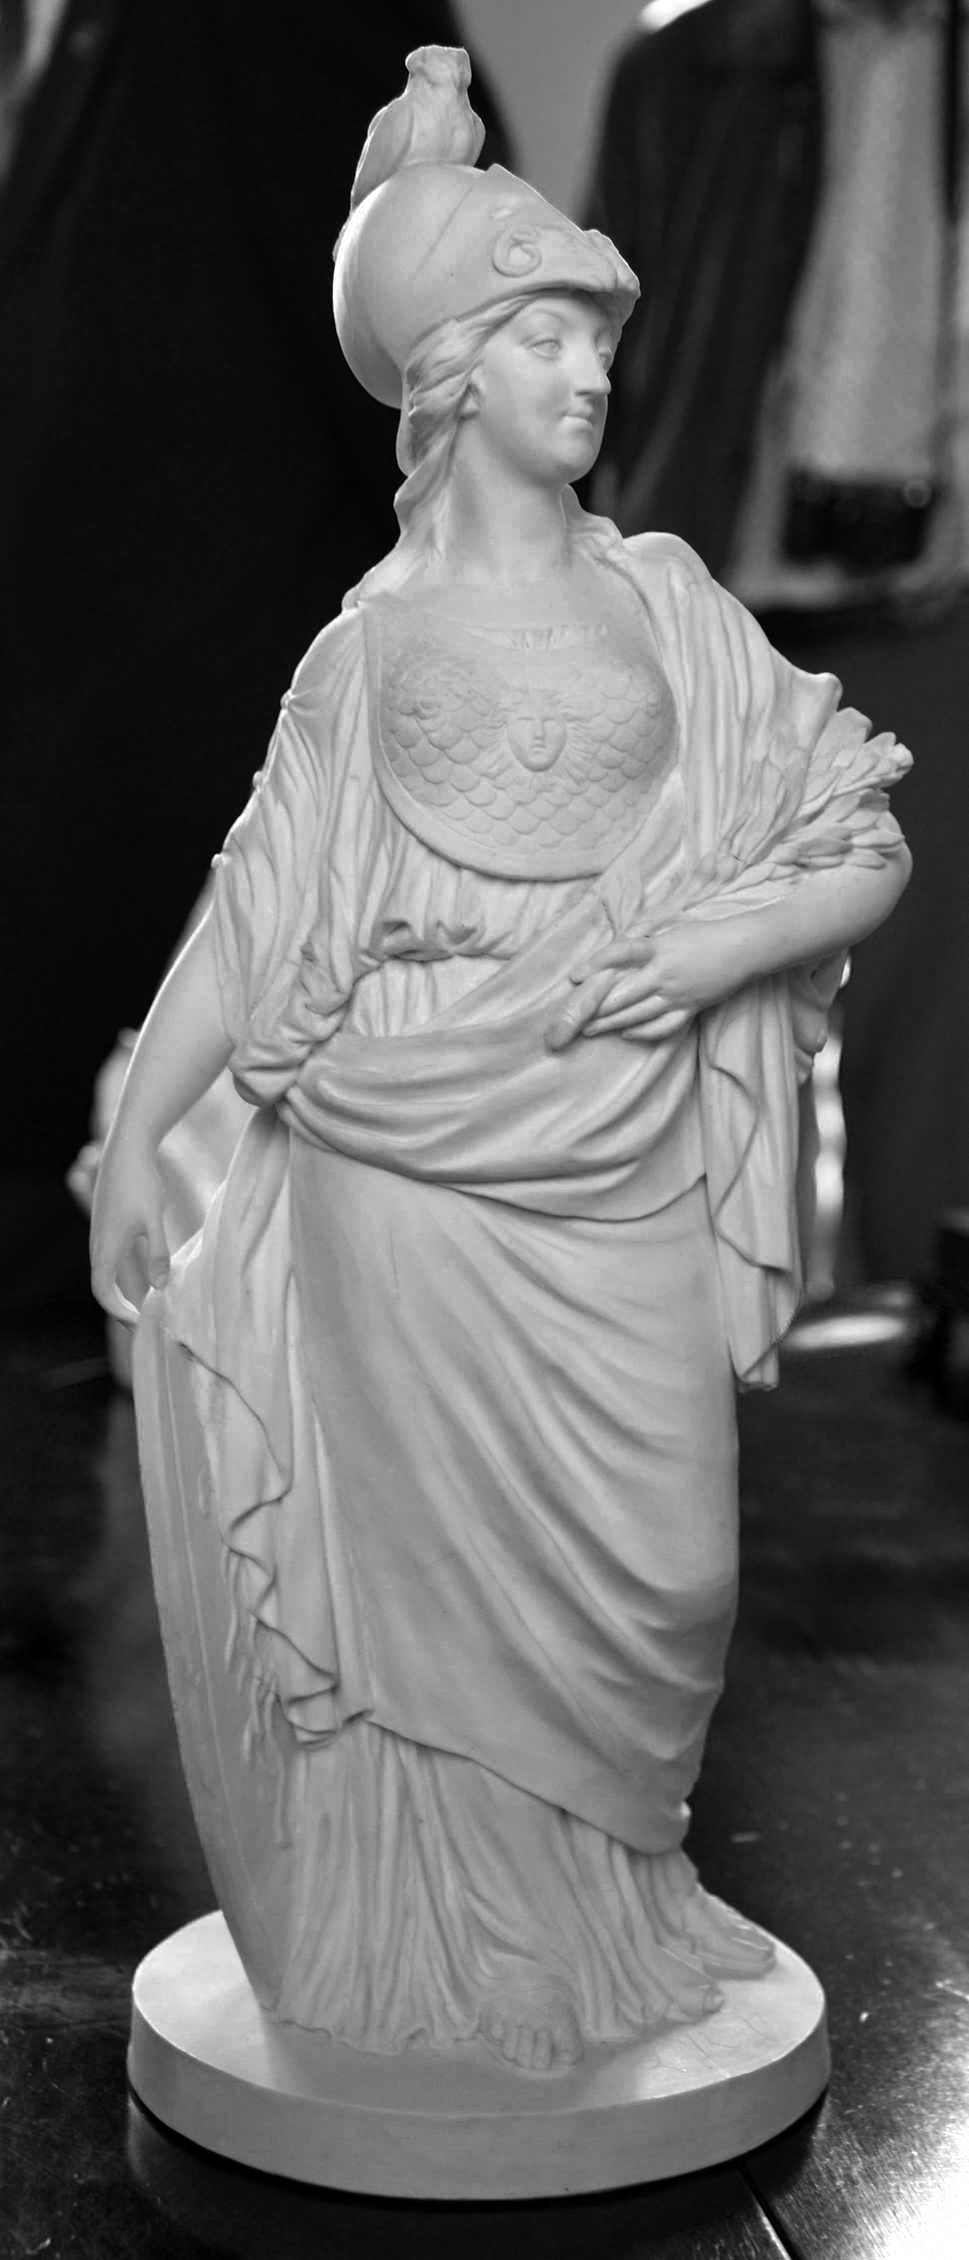 Josse-François-Joseph Le Riche (1741–1812) (?), Marie Antoinette als Minerva, 1779, 40,2 x 16 x 14,1 cm, Biskuitporzellan, Privatsammlung Bernard Dragesco (Friedrich Polleroß).